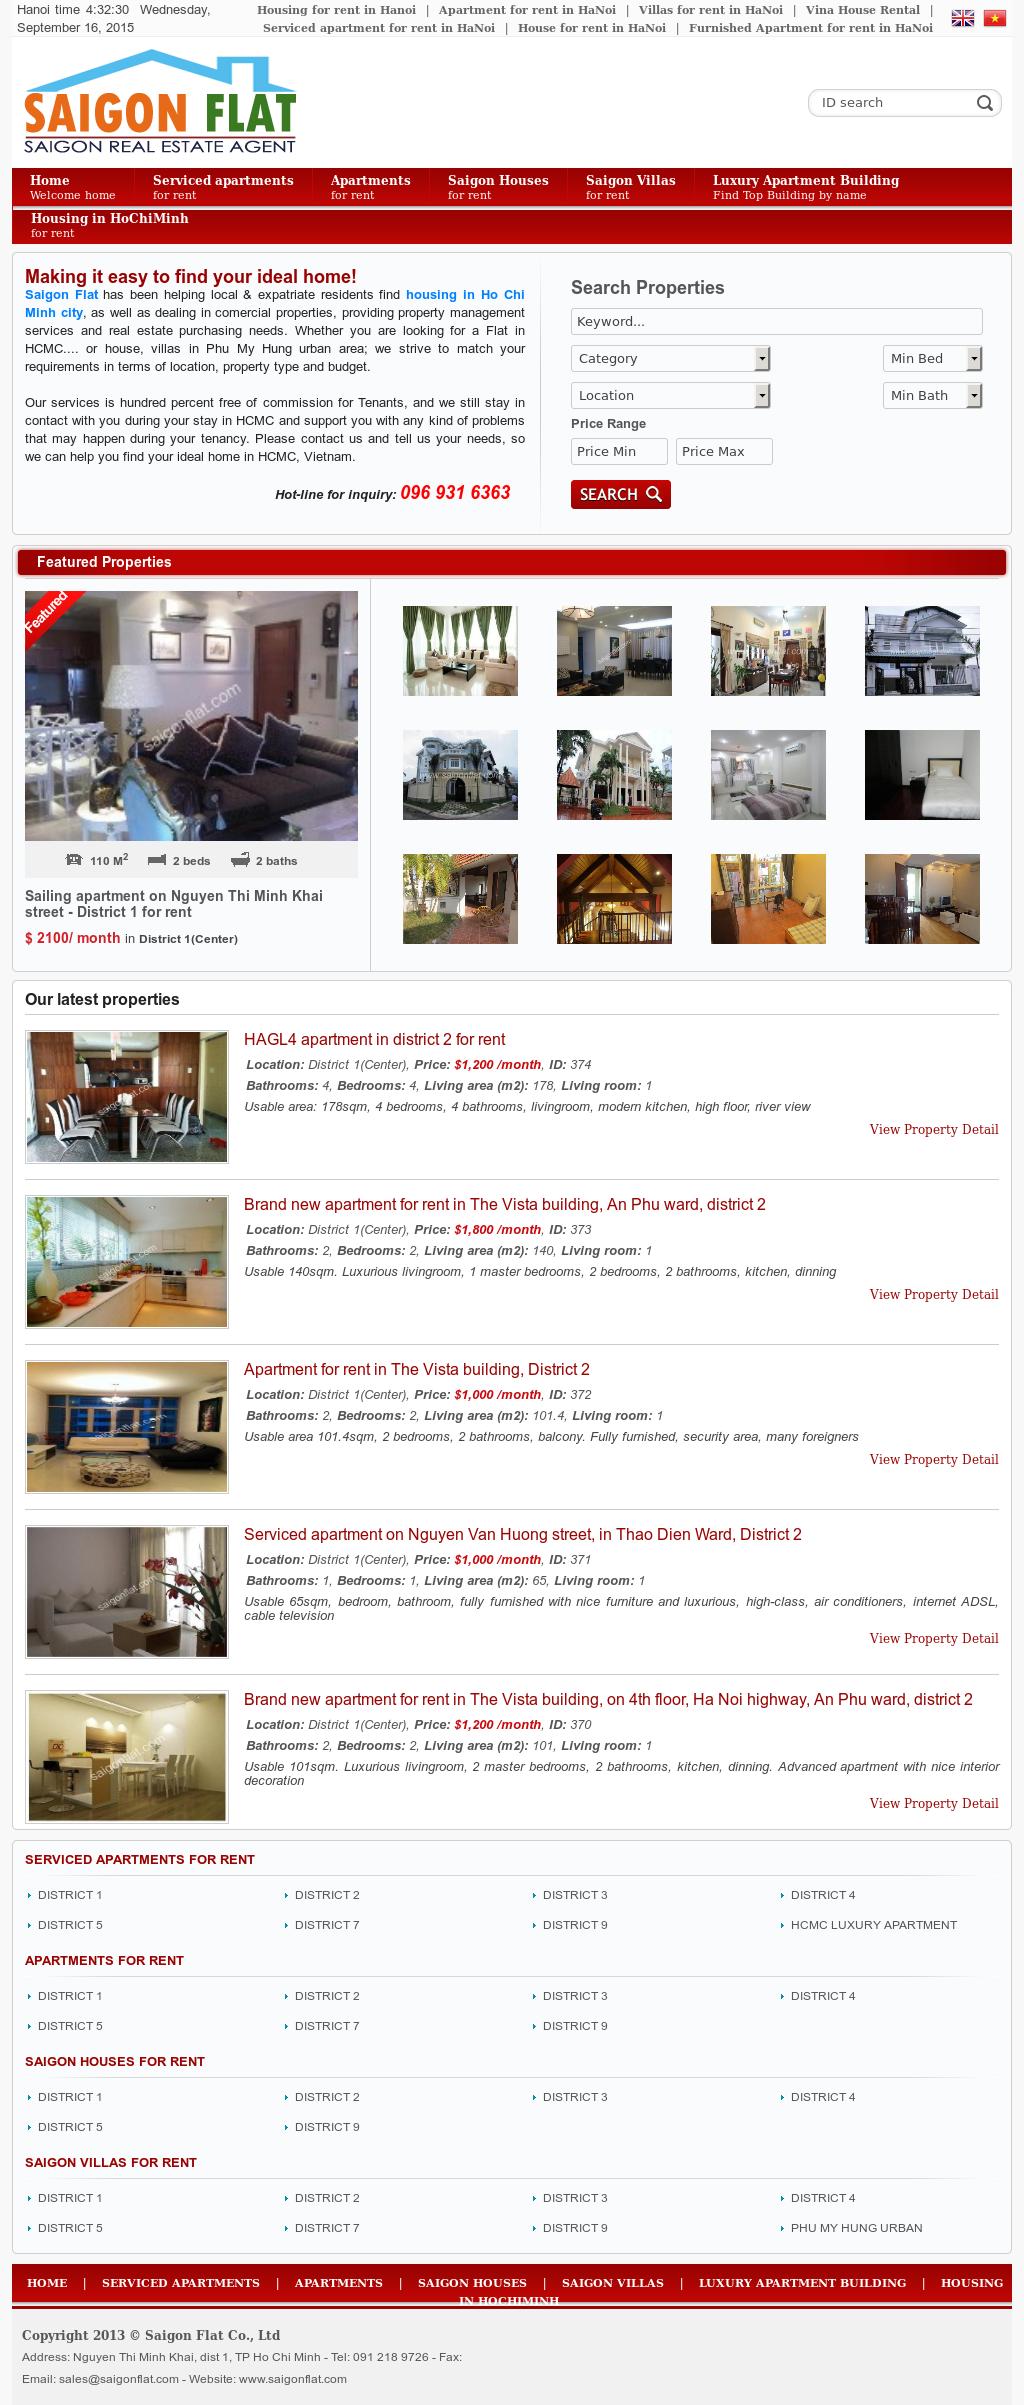 Saigon Flat Competitors, Revenue and Employees - Owler Company Profile